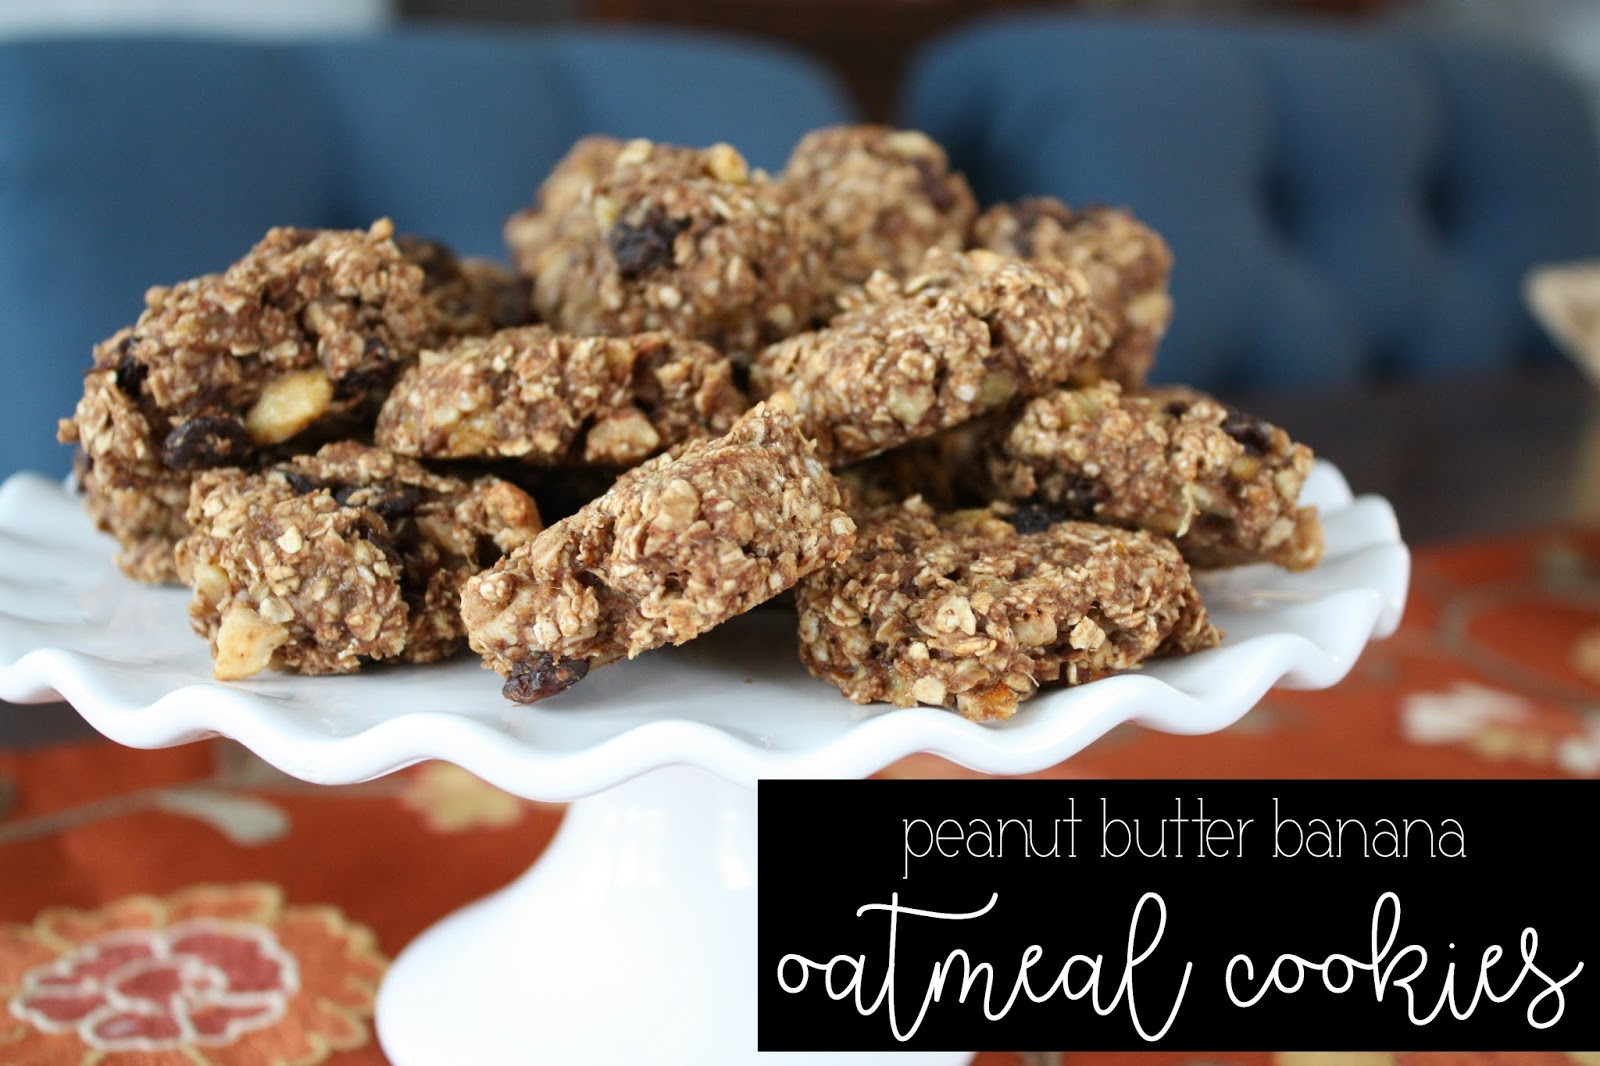 Healthy Peanut Butter Banana Oatmeal Cookies  Healthy Peanut Butter Banana Oatmeal Cookies